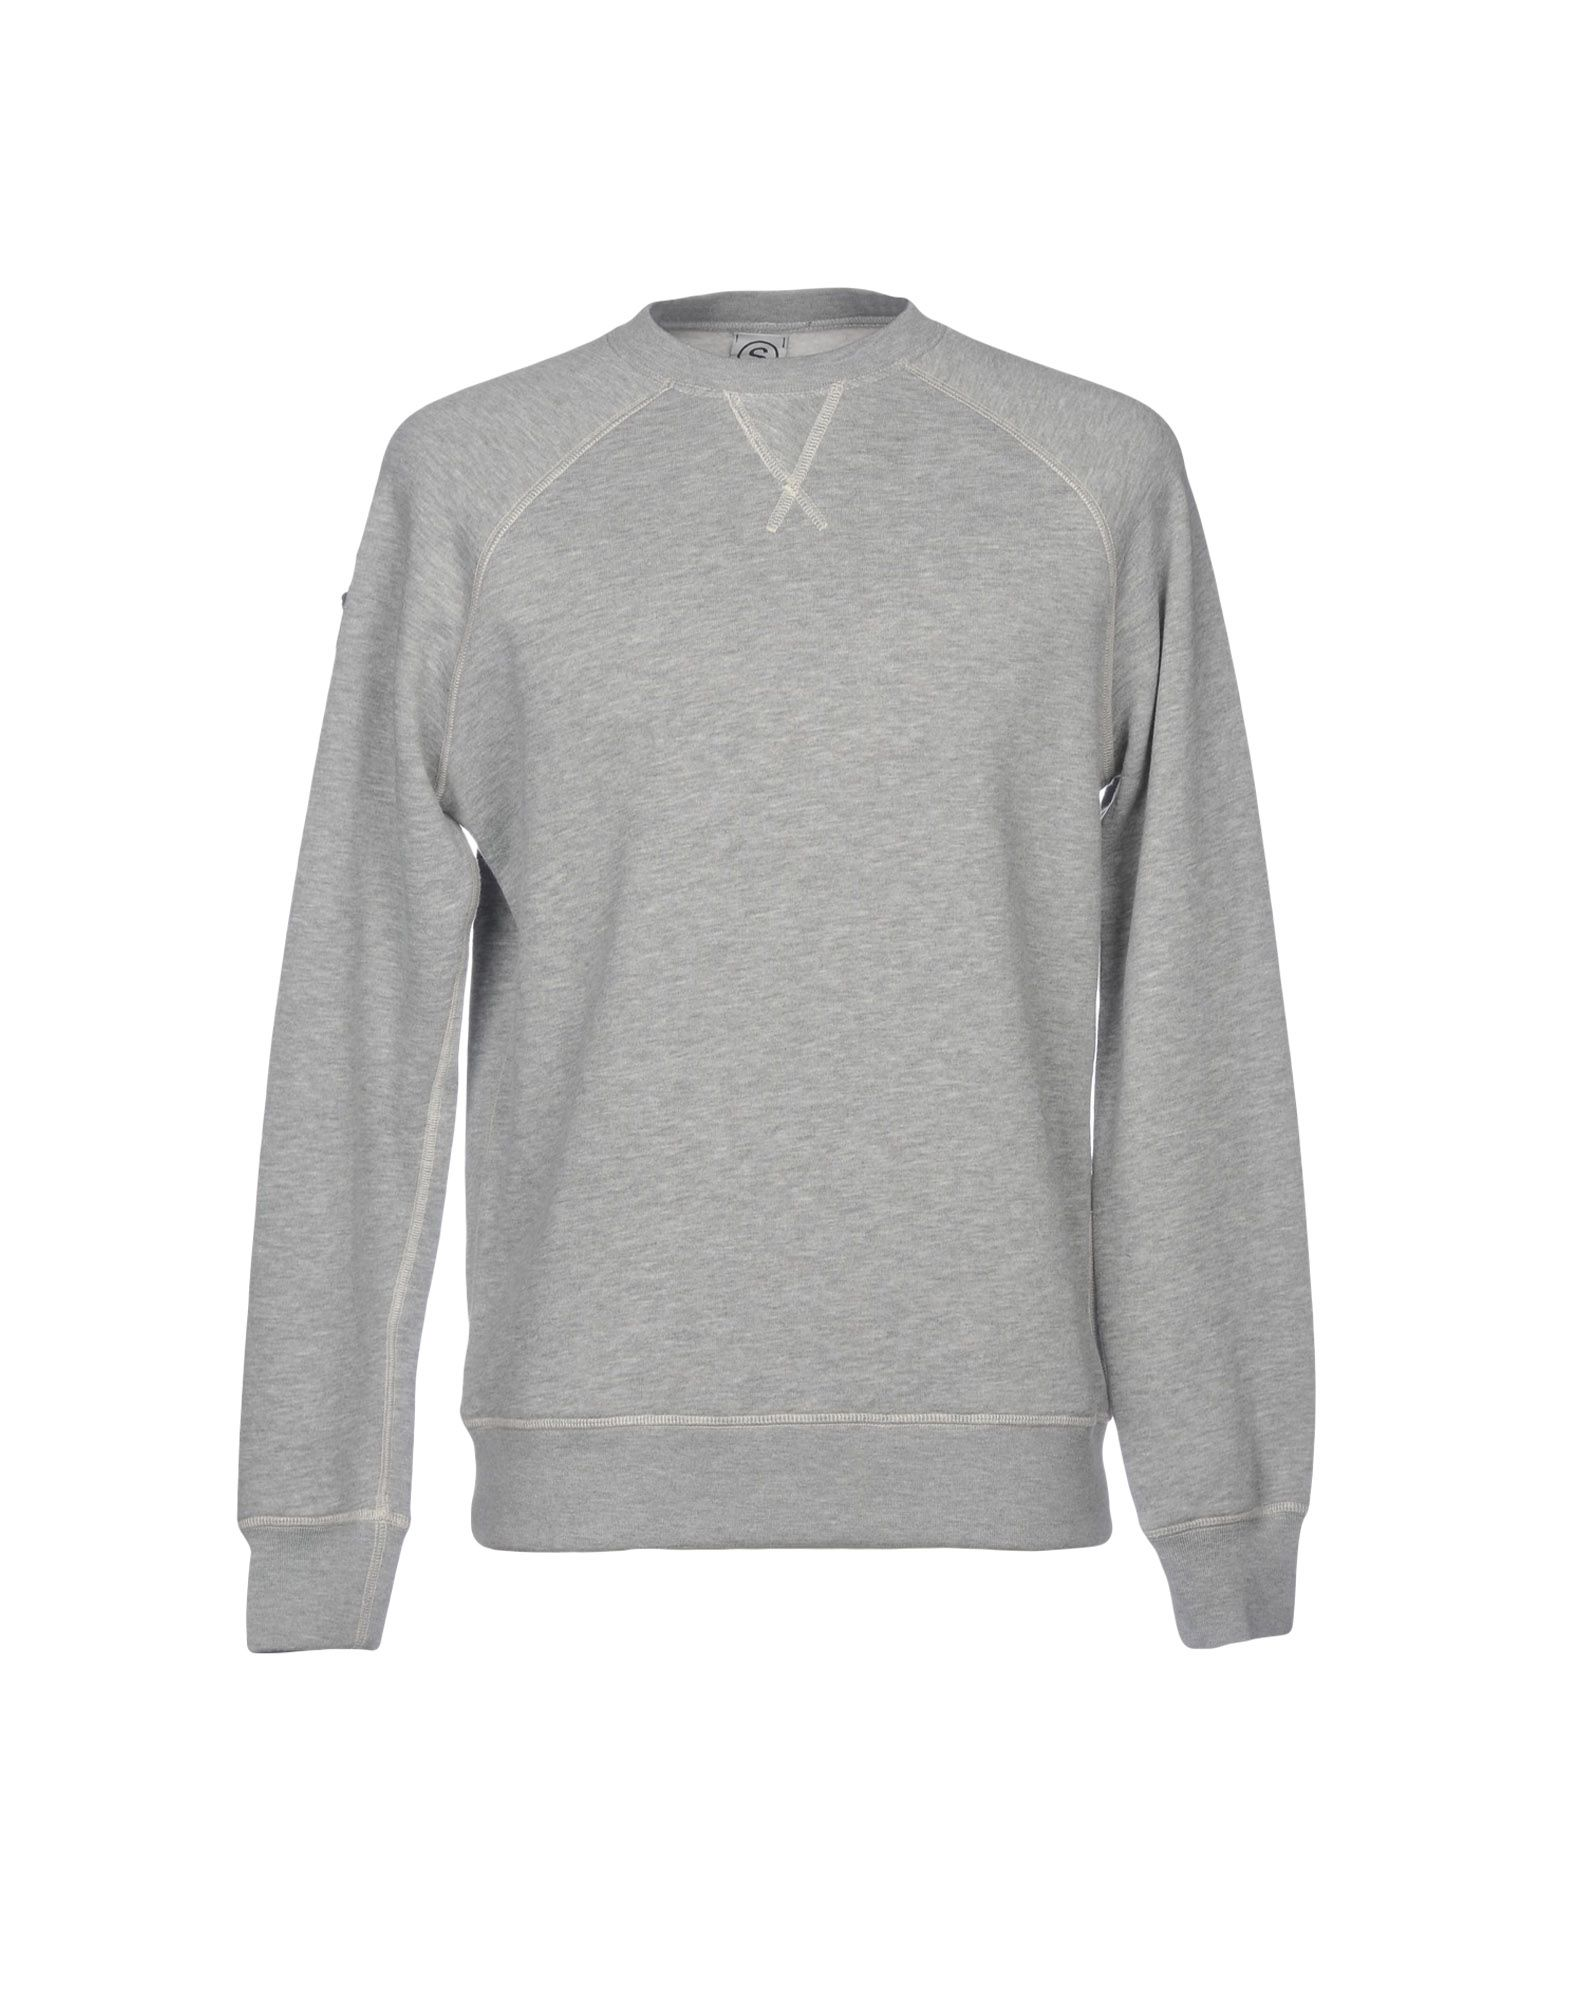 SOHO Sweatshirt in Light Grey